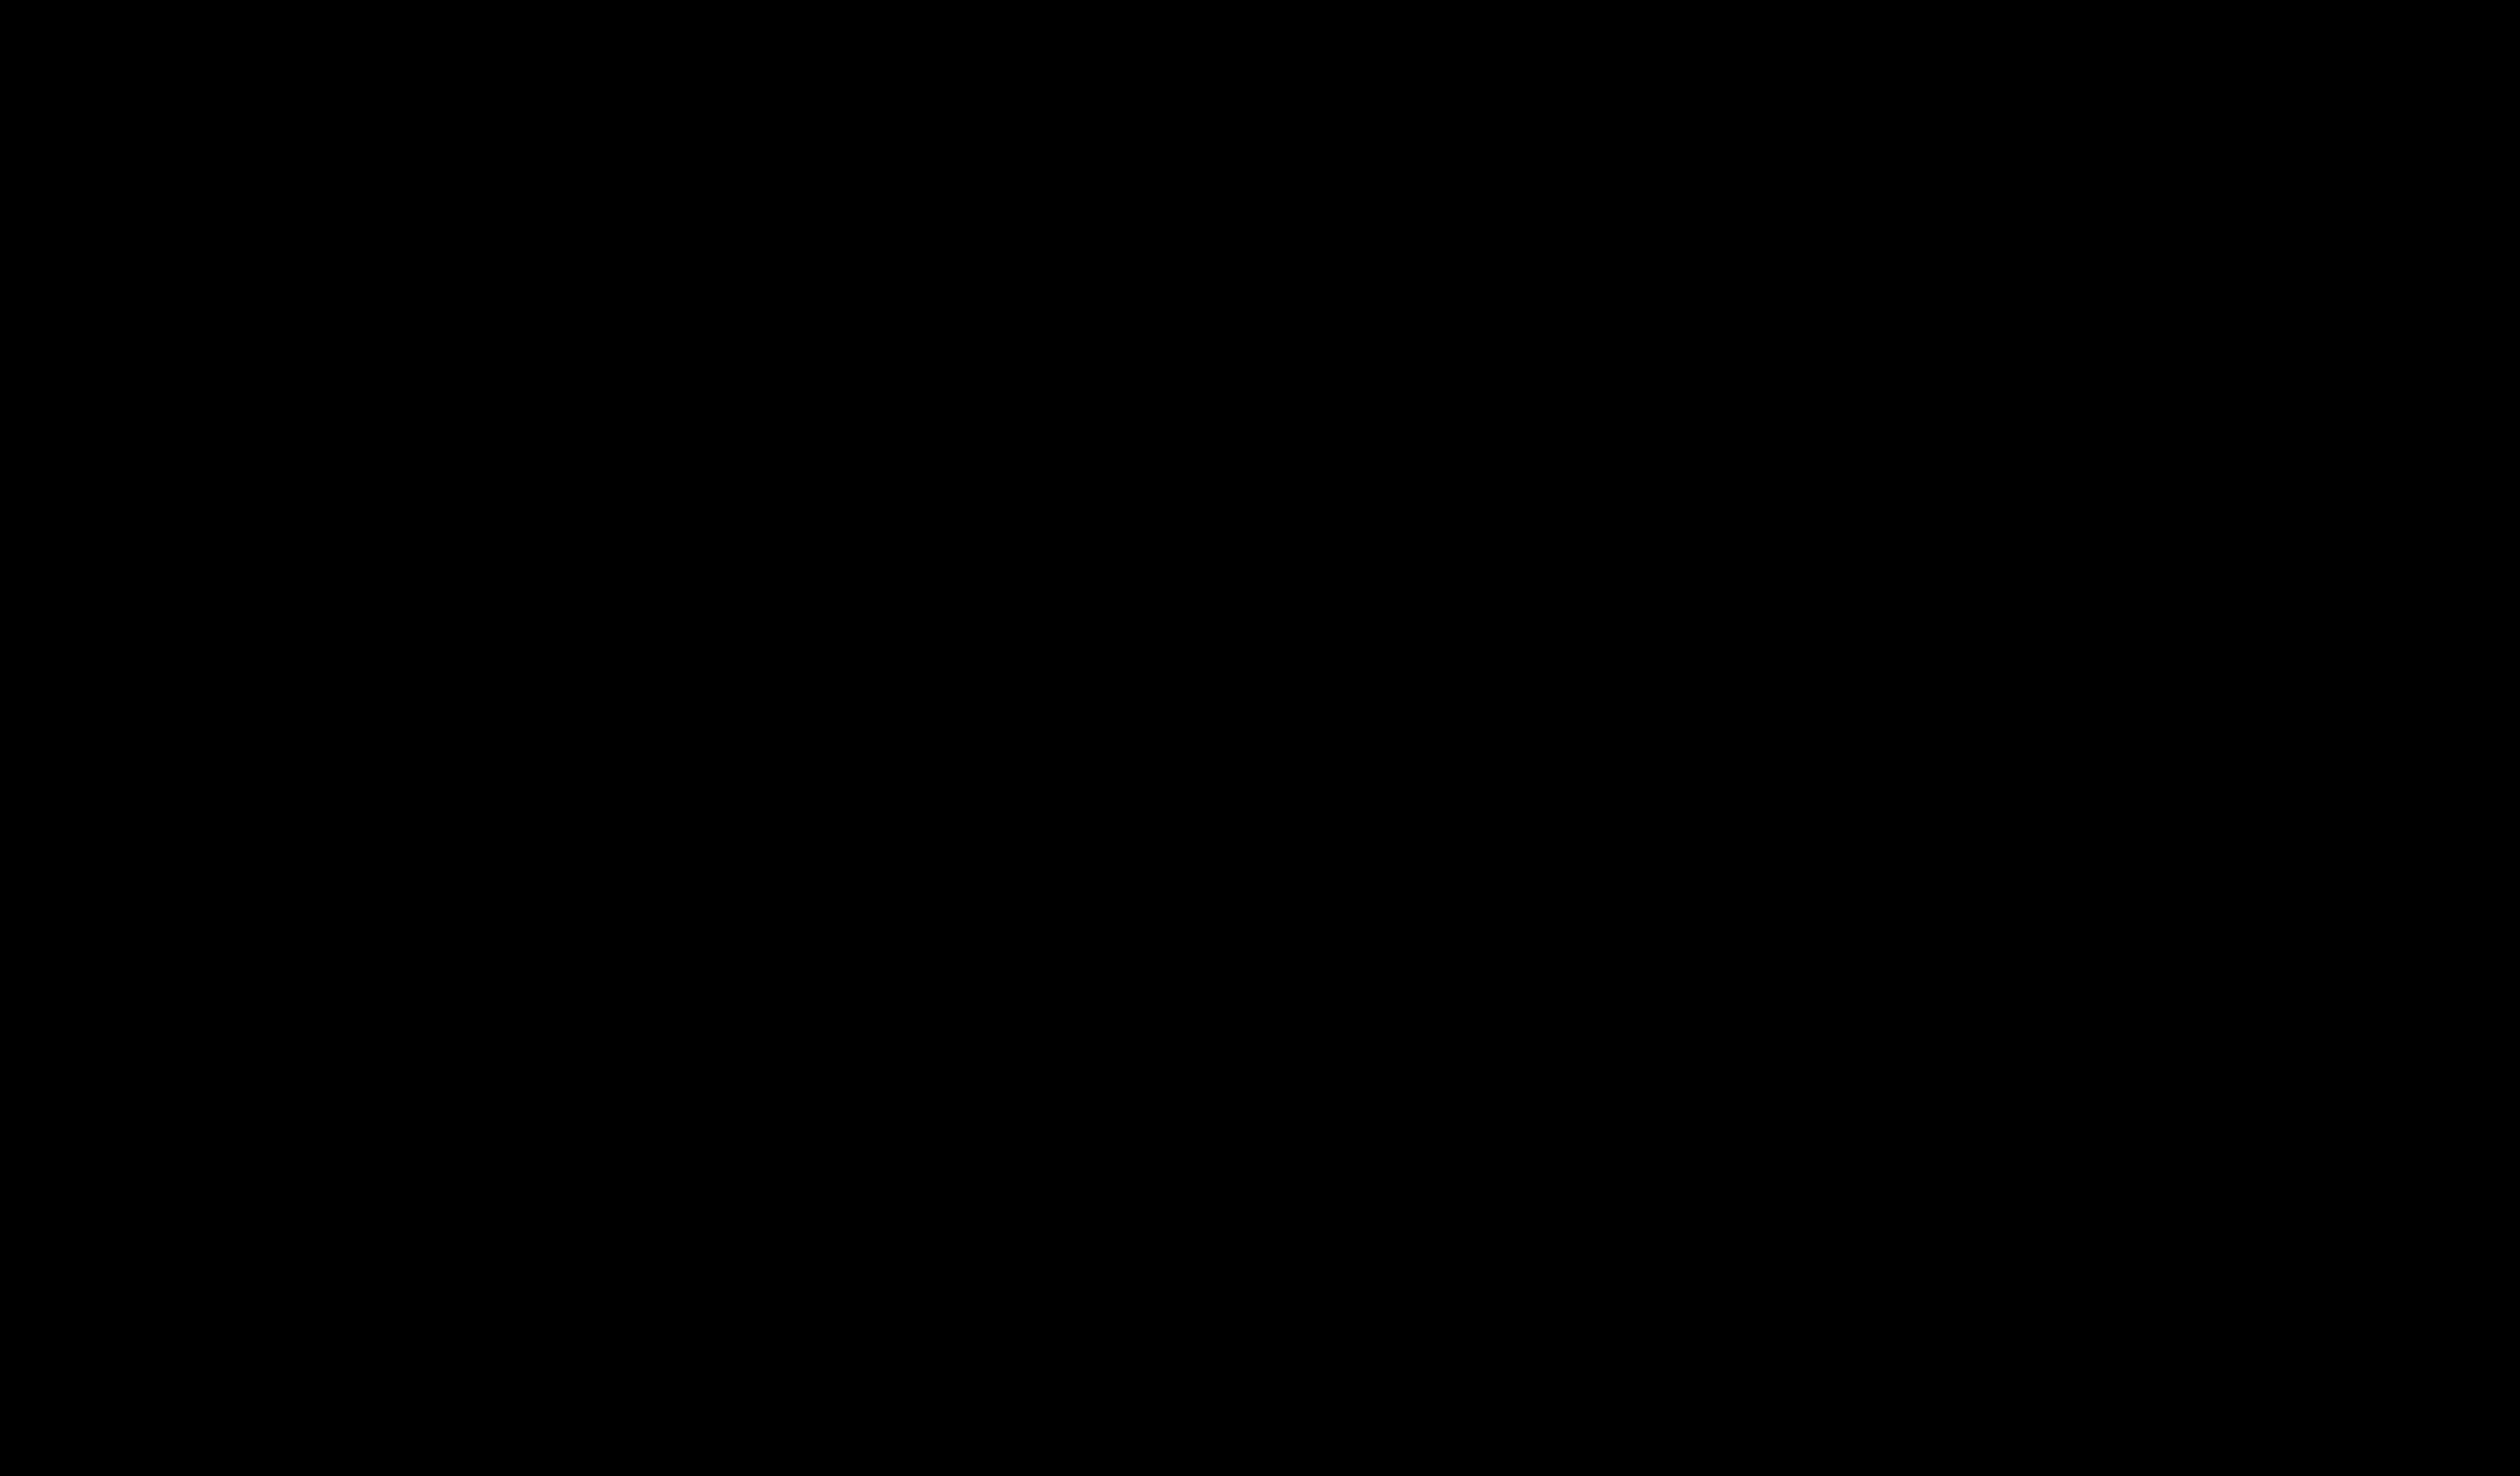 Scuba Diver Clipart Png Transparent Png.